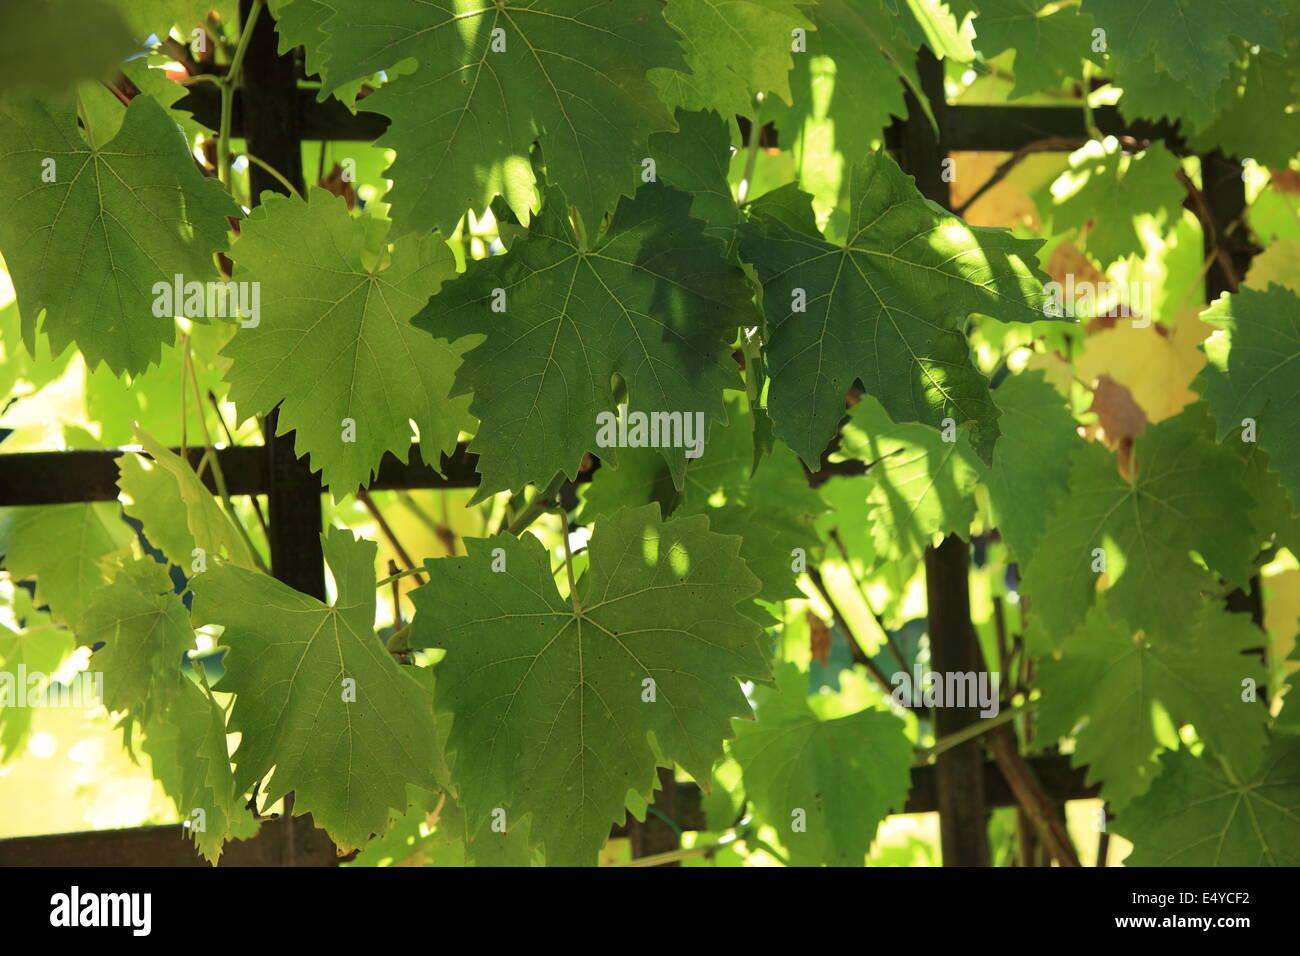 Growing On Lattice Stockfotos & Growing On Lattice Bilder - Alamy